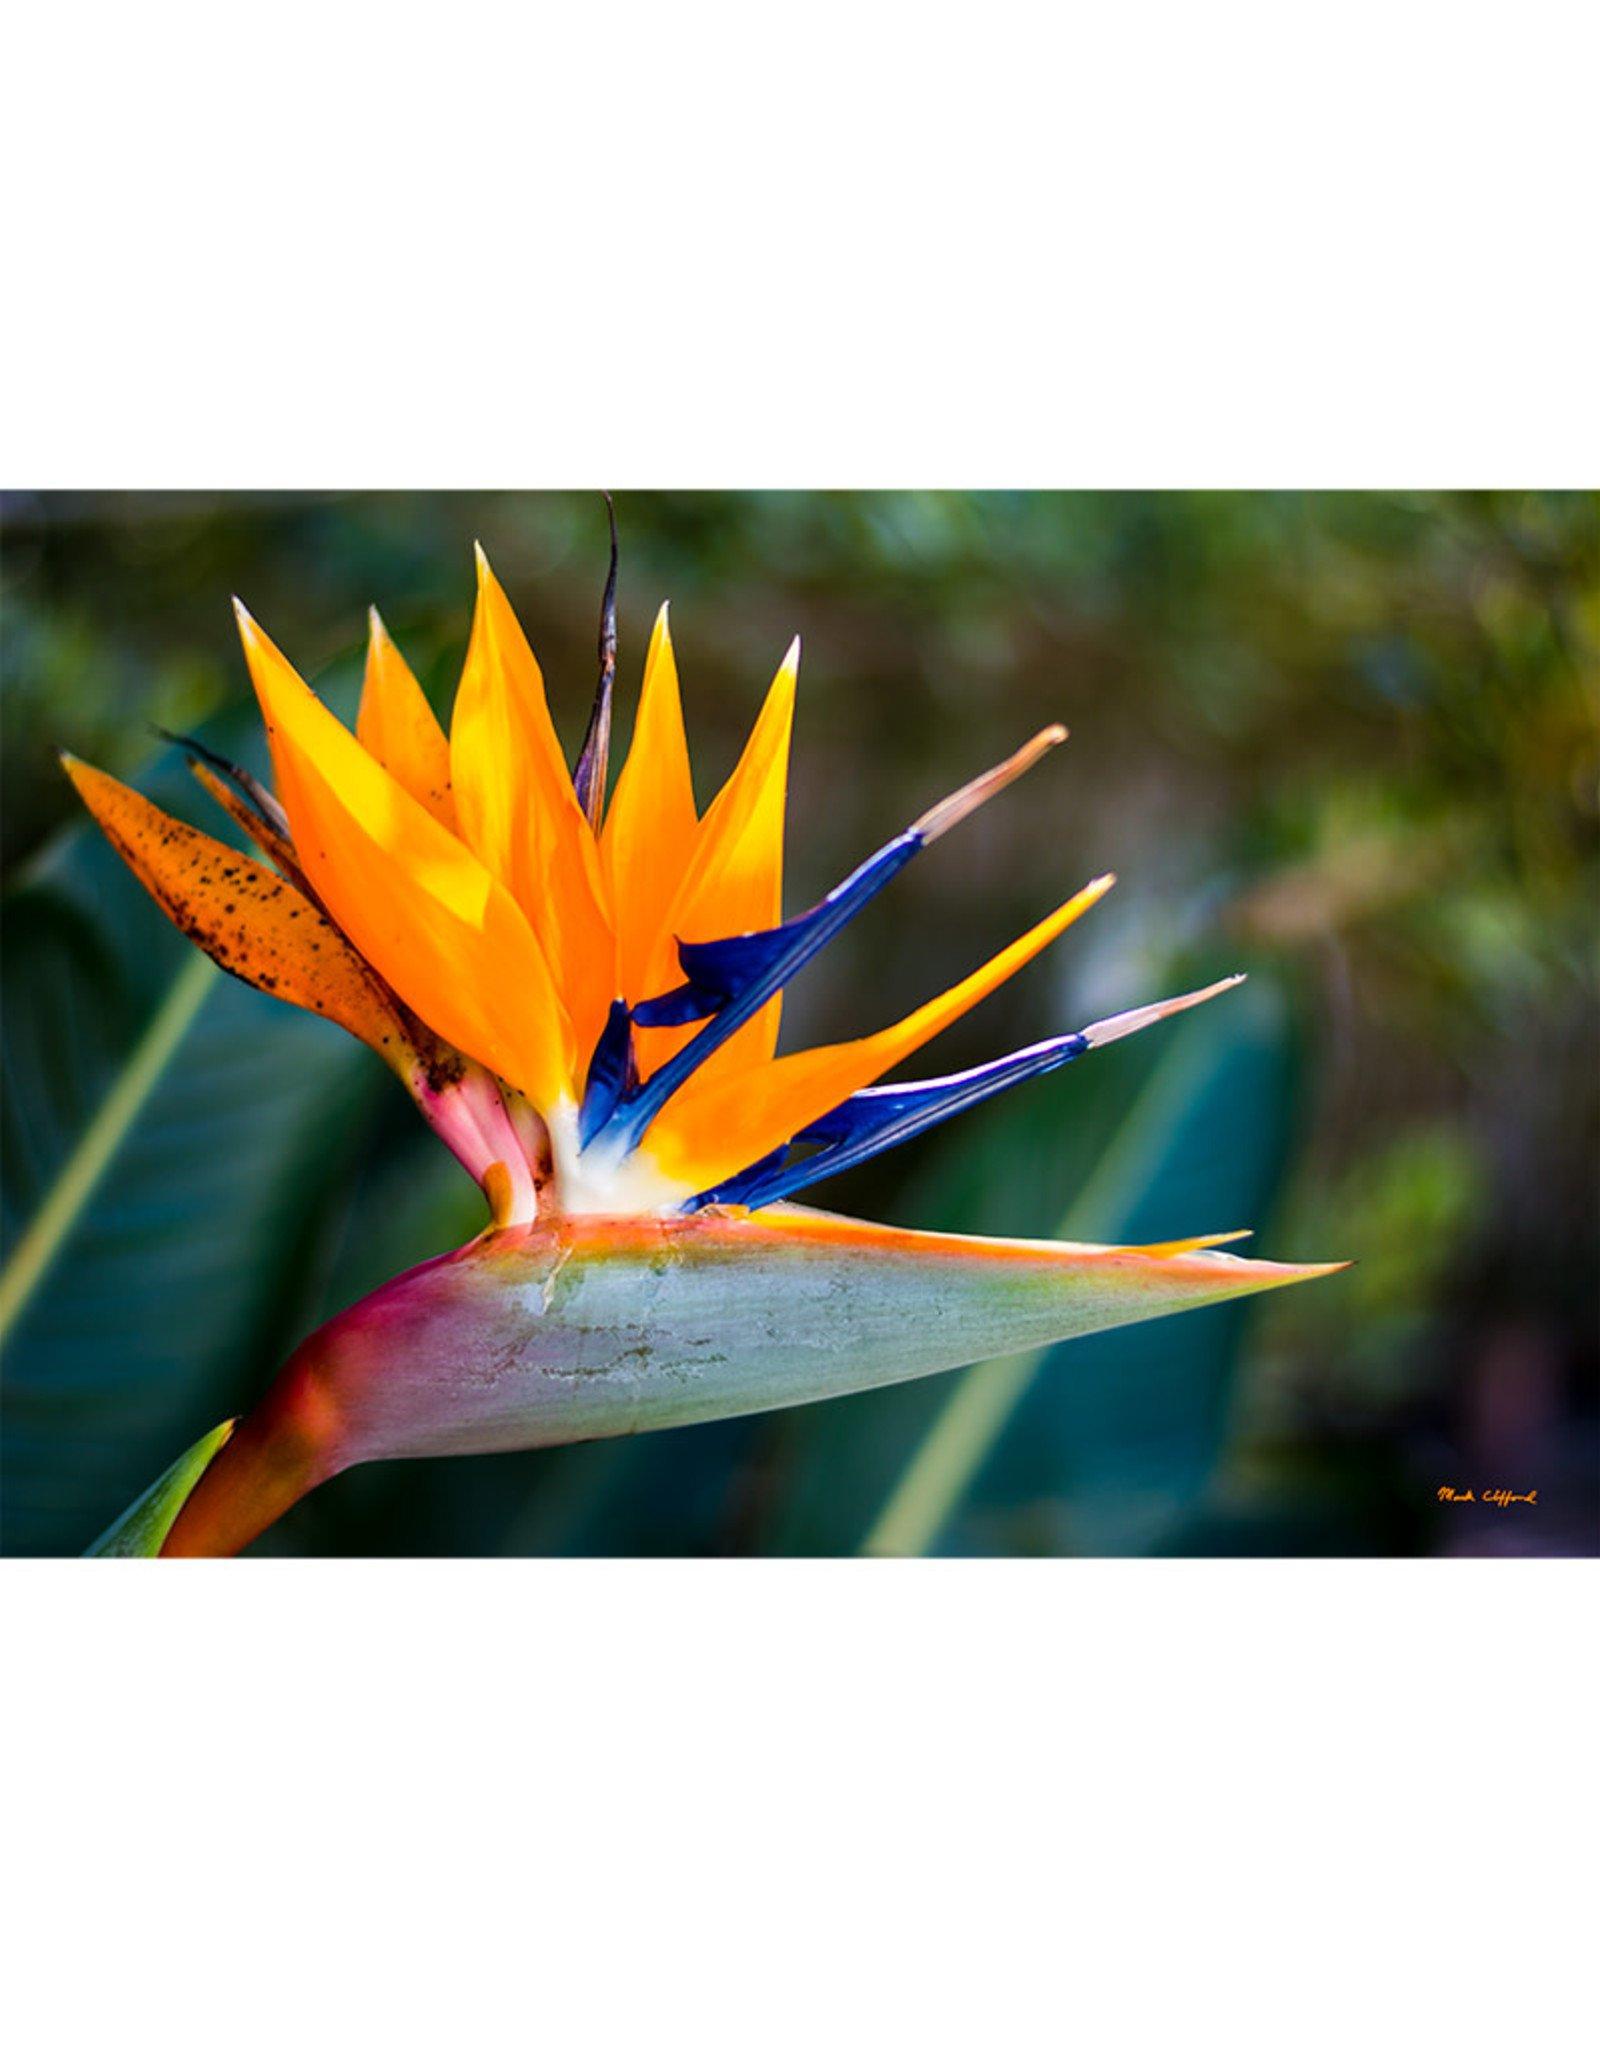 "Mark Clifford Bird of Paradise, 21"" by 14"" Framed Canvas Print"